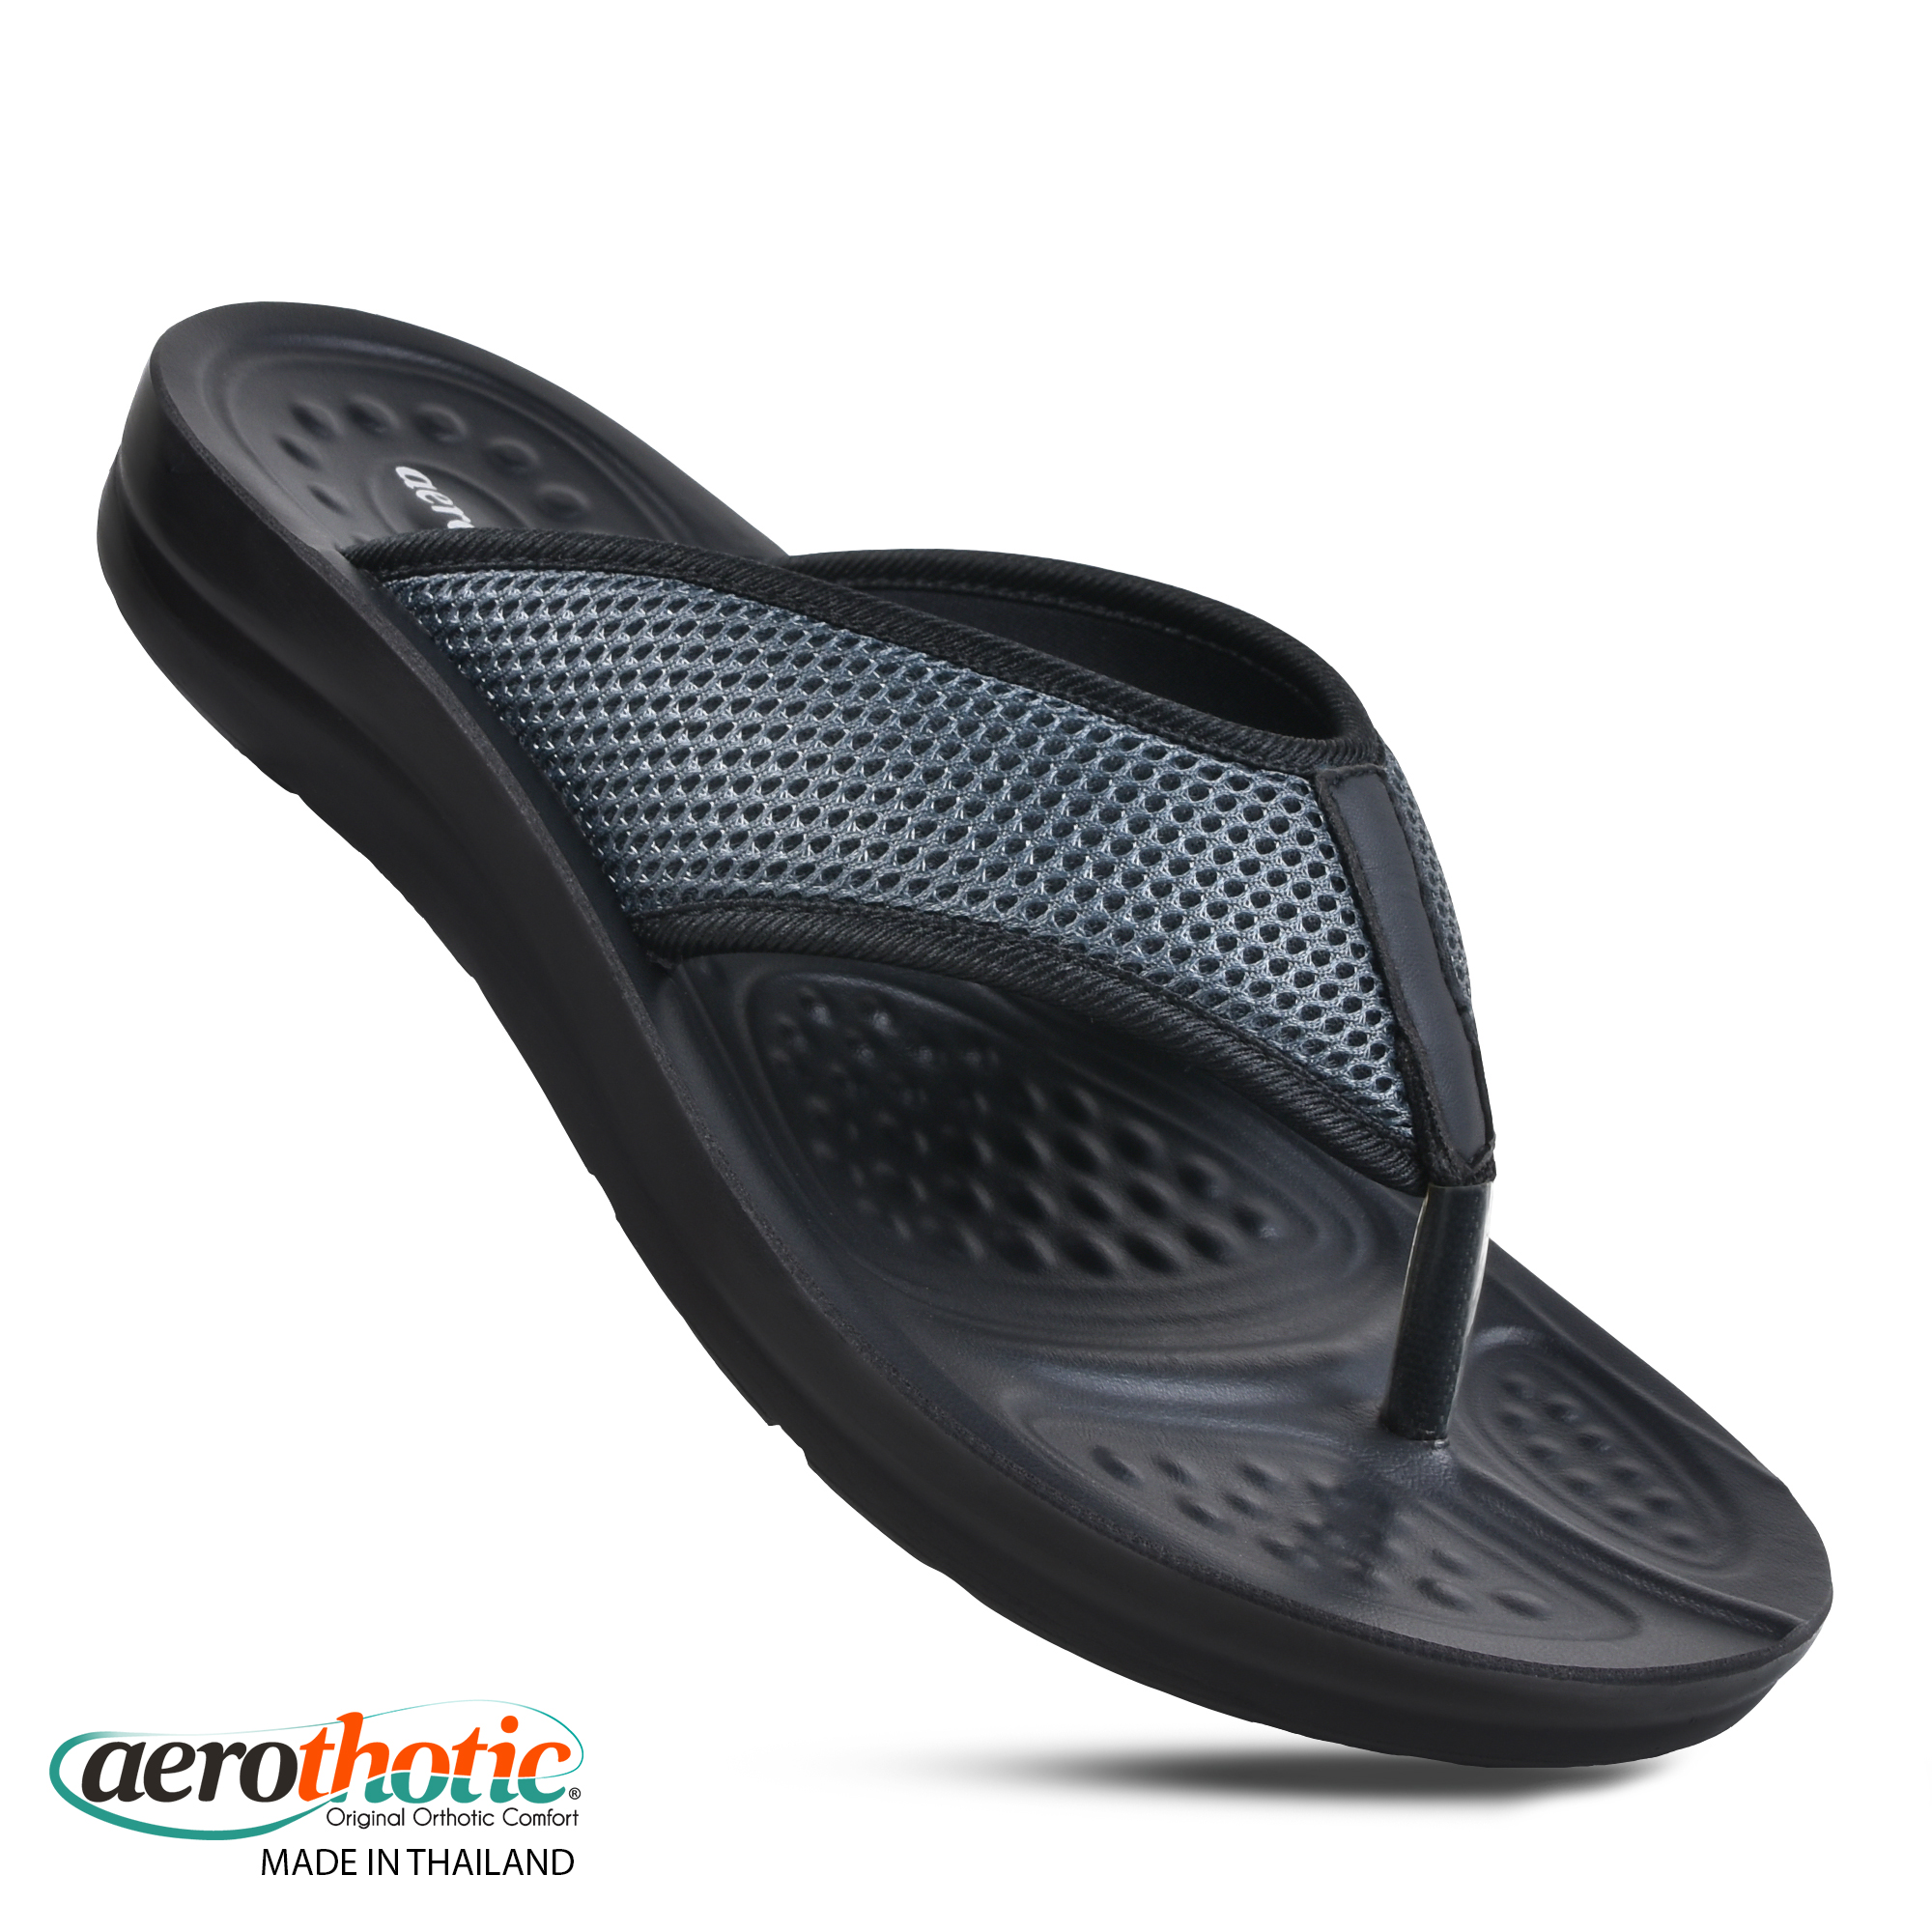 AEROTHOTIC Gents Ultra Soft Fashion Flip Flops - Original Thailand Imported - M0608